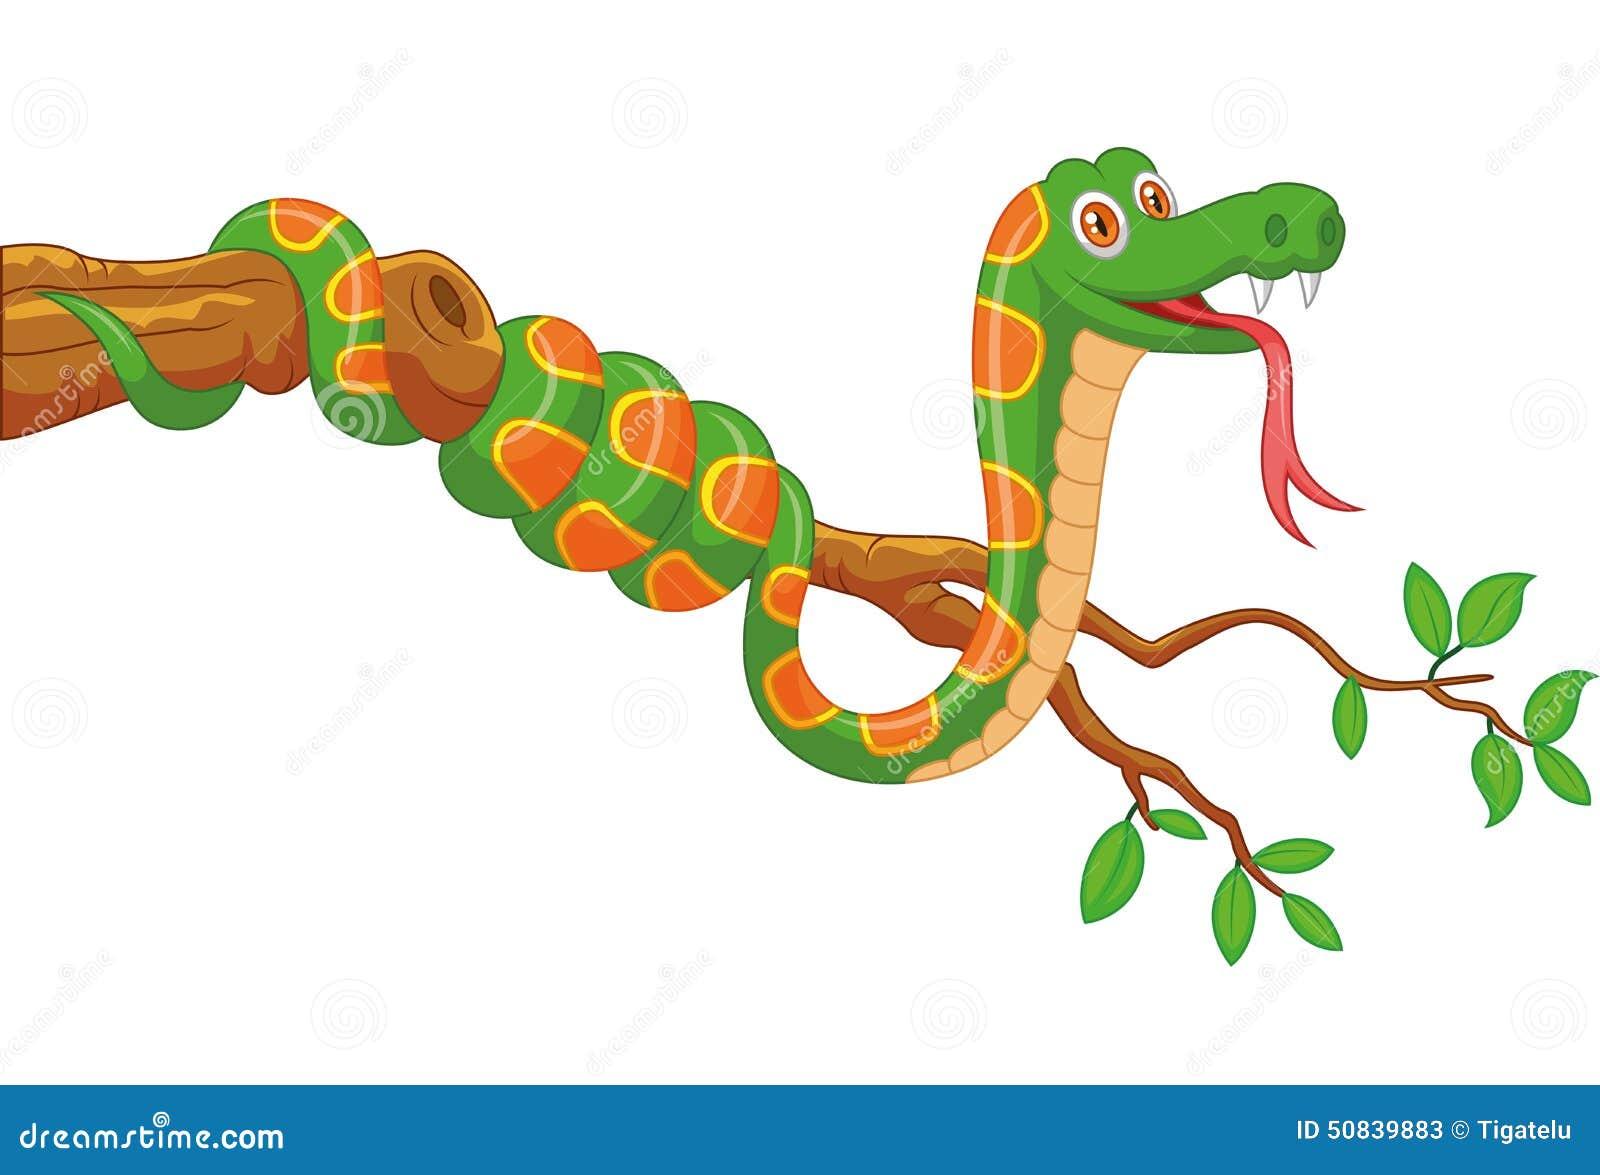 Green snake cartoon royalty free stock image image 19462406 -